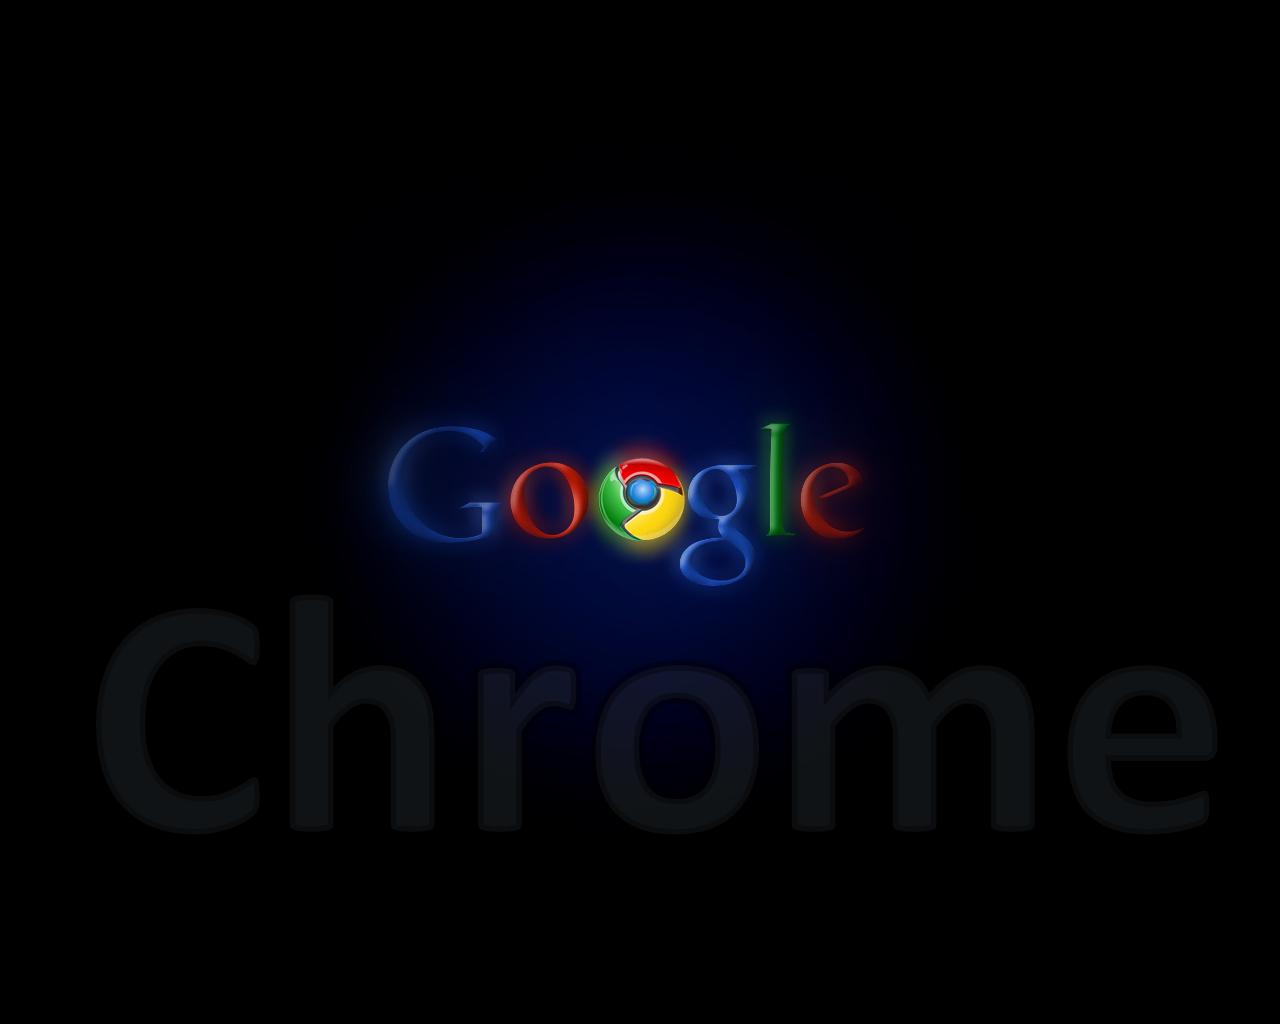 Top Google Chrome Wallpapers 1280x1024